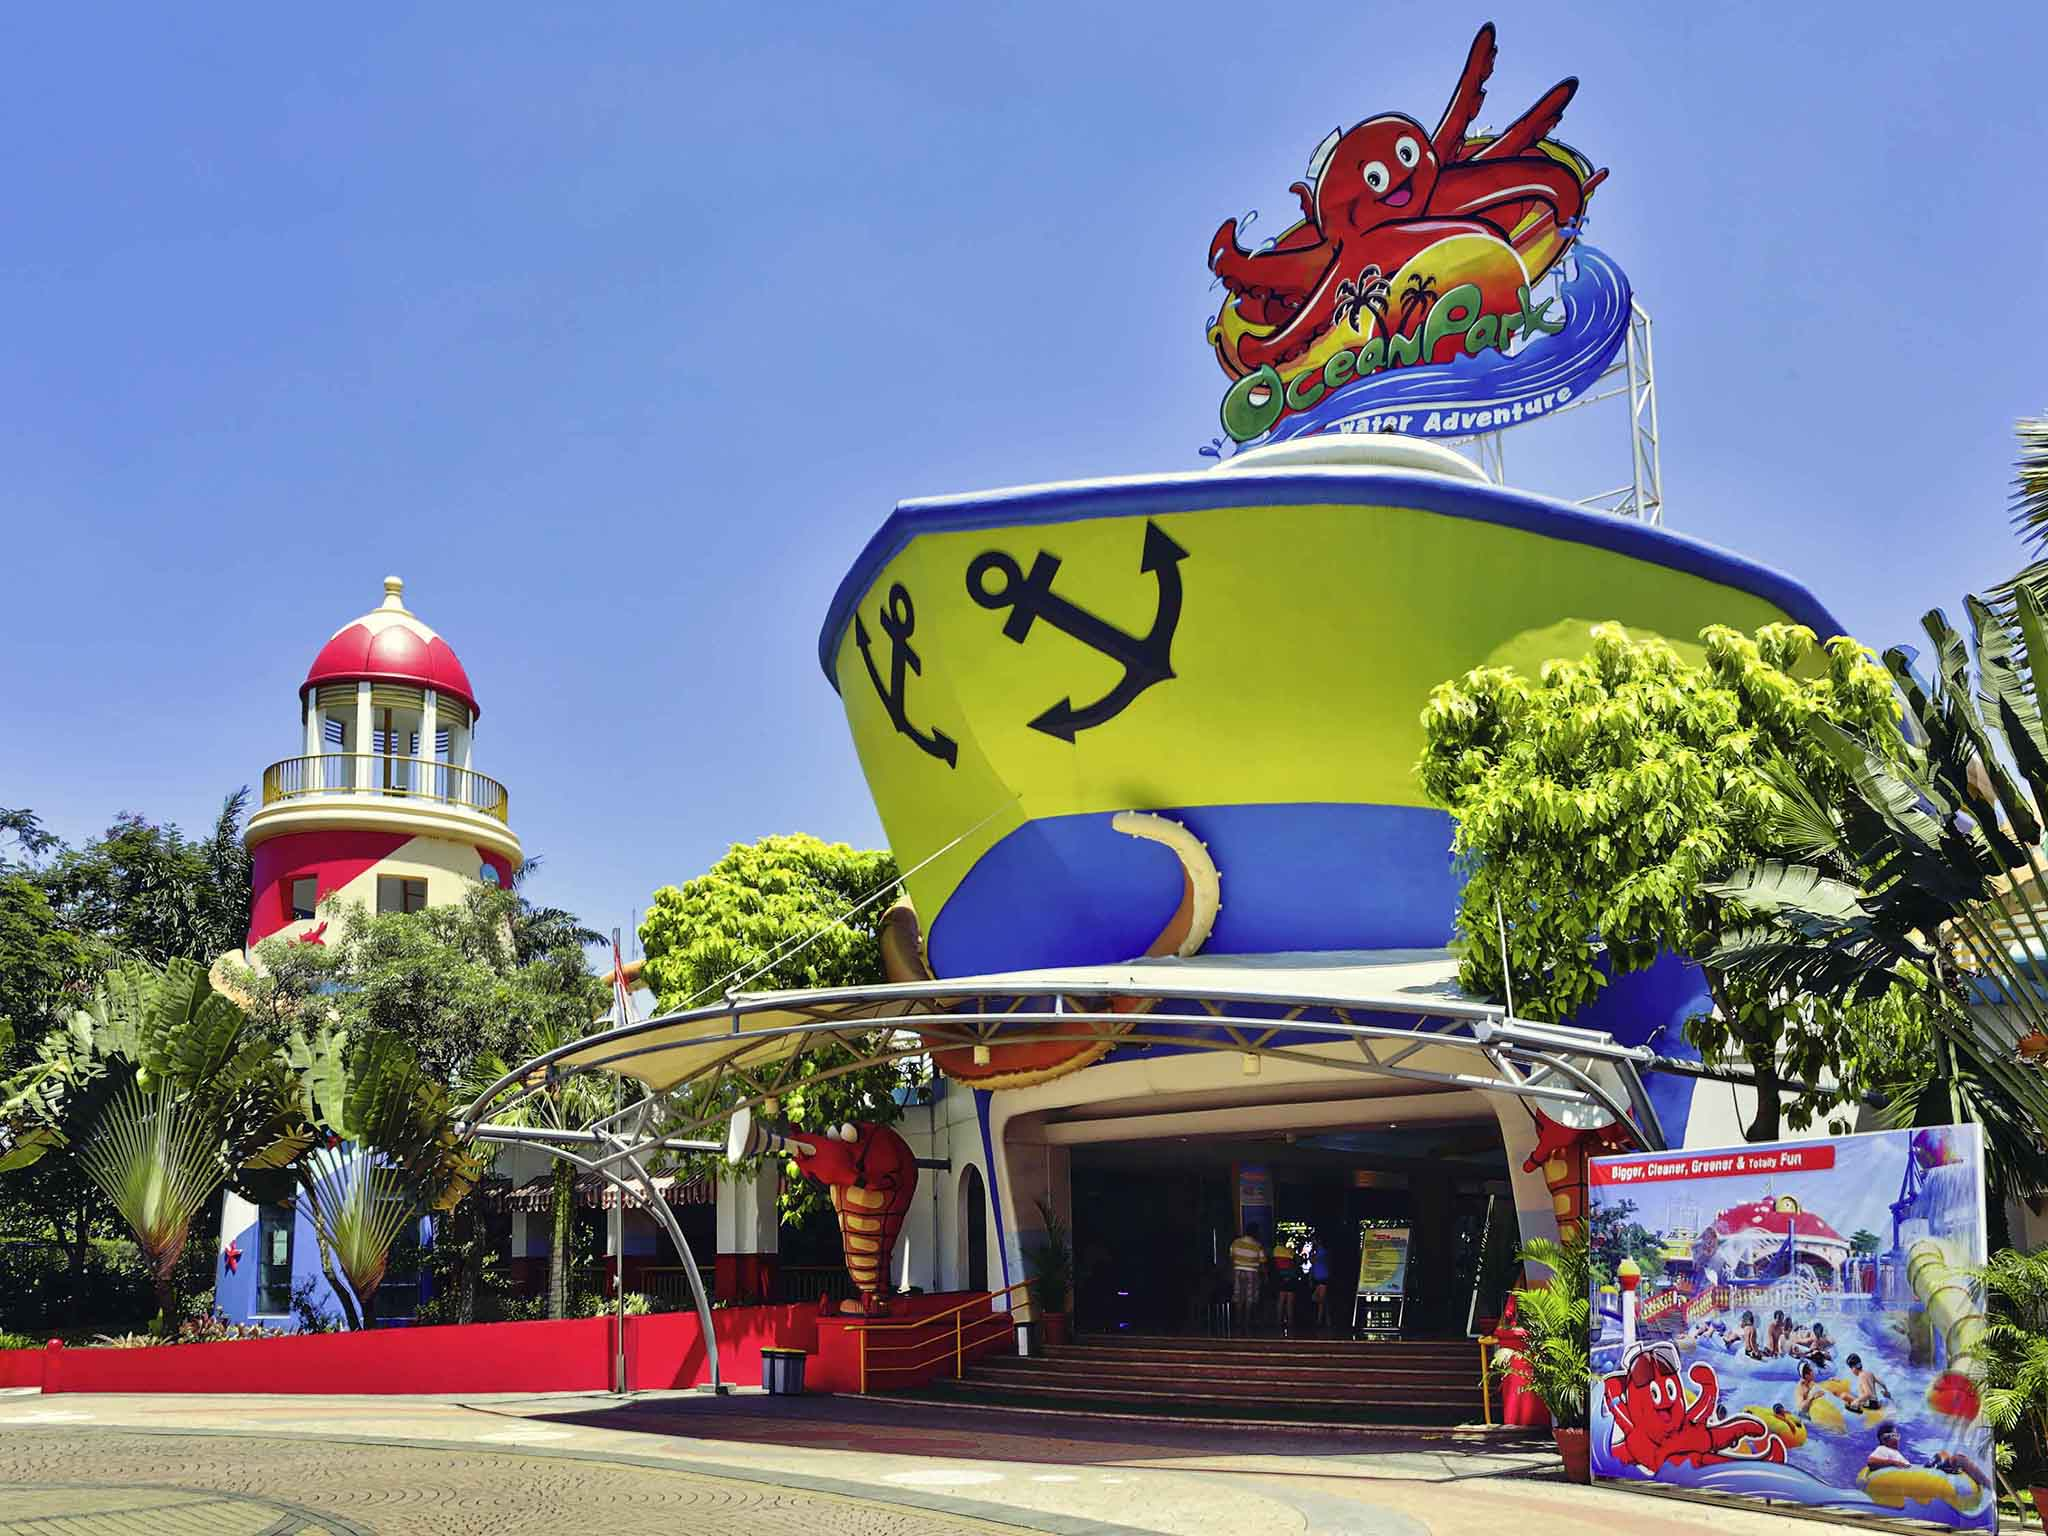 Ibis Styles Jakarta Mangga Dua Square Premiumeconomy Hotel Paket Murmer Acces Point Komplit Destination